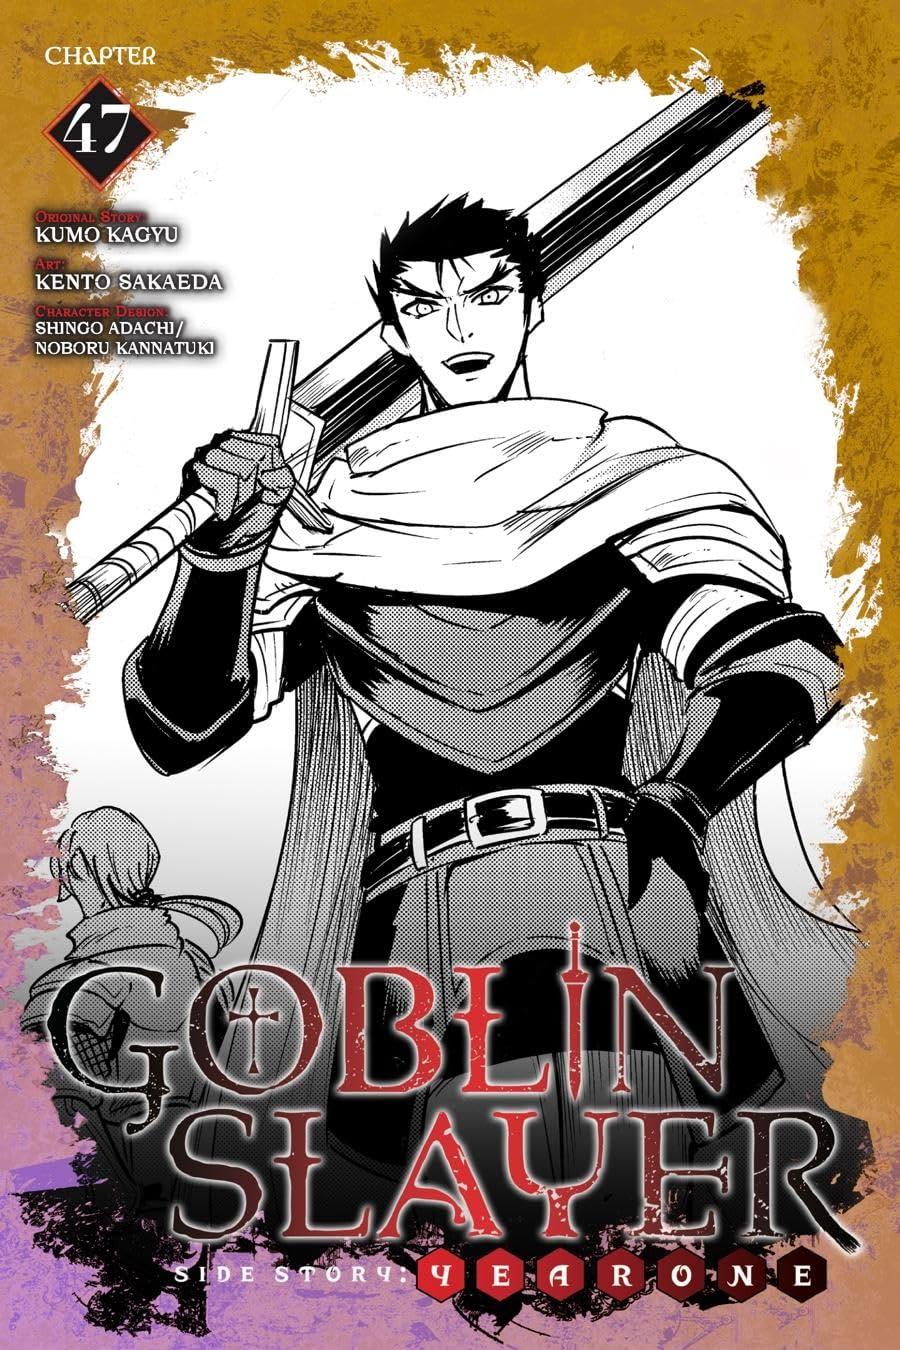 Goblin Slayer Side Story: Year One #47